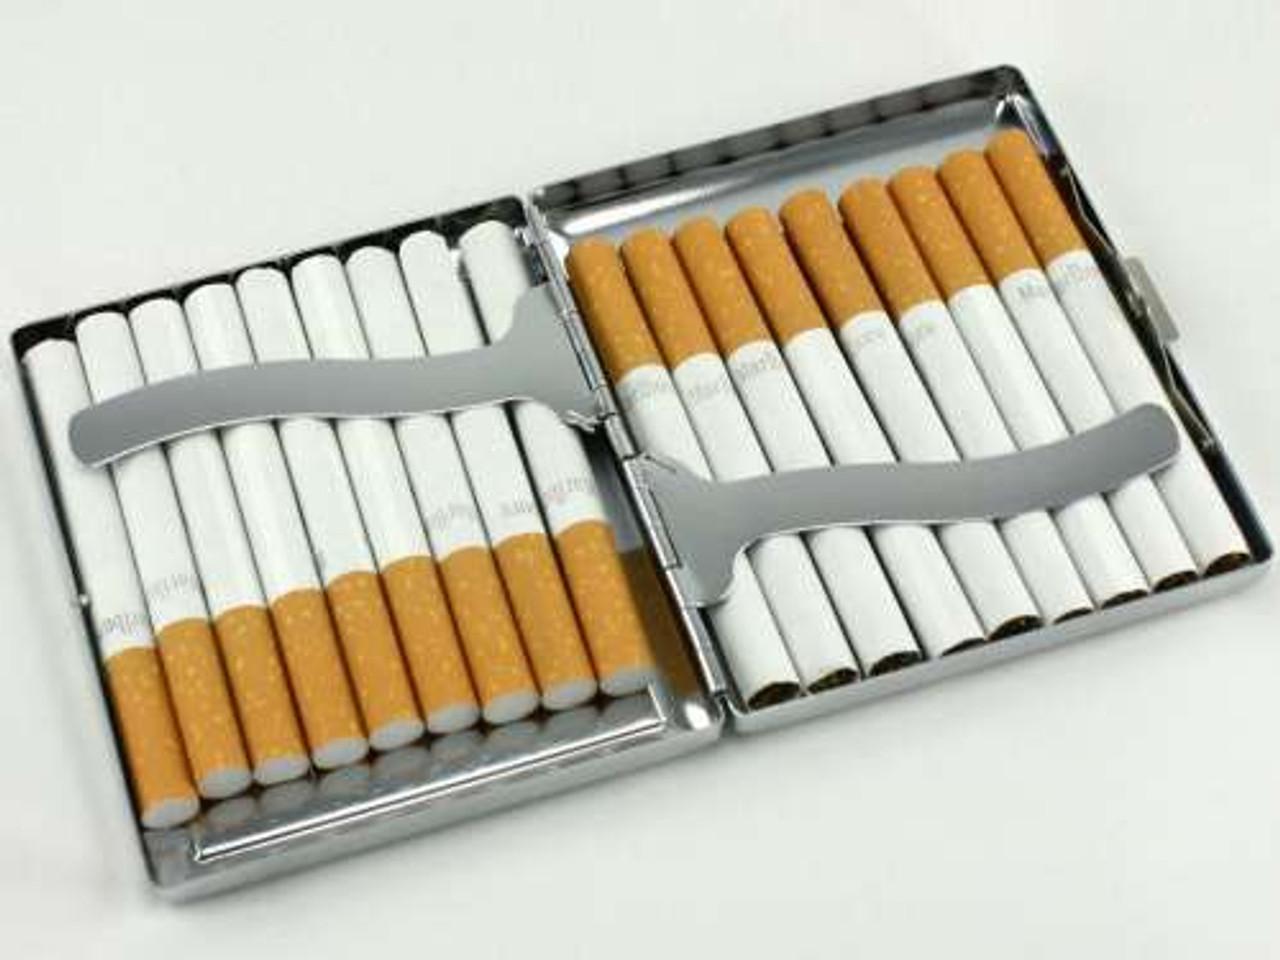 Rolling Stones Cigarette Case